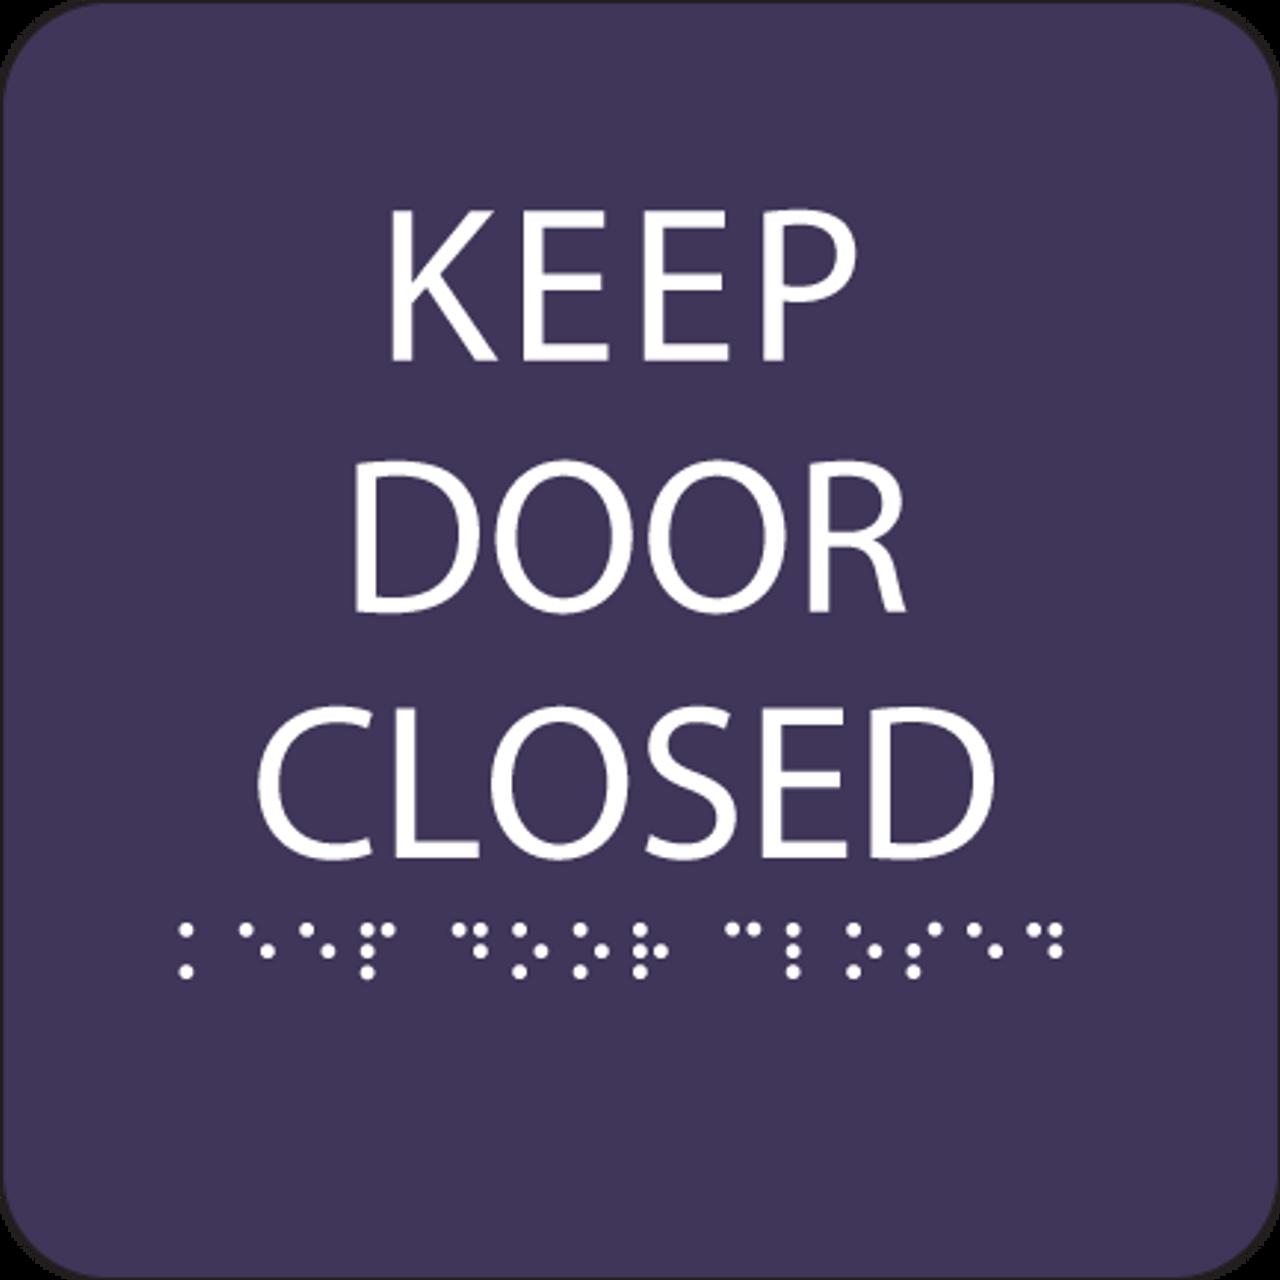 Purple Keep Door Closed ADA Sign